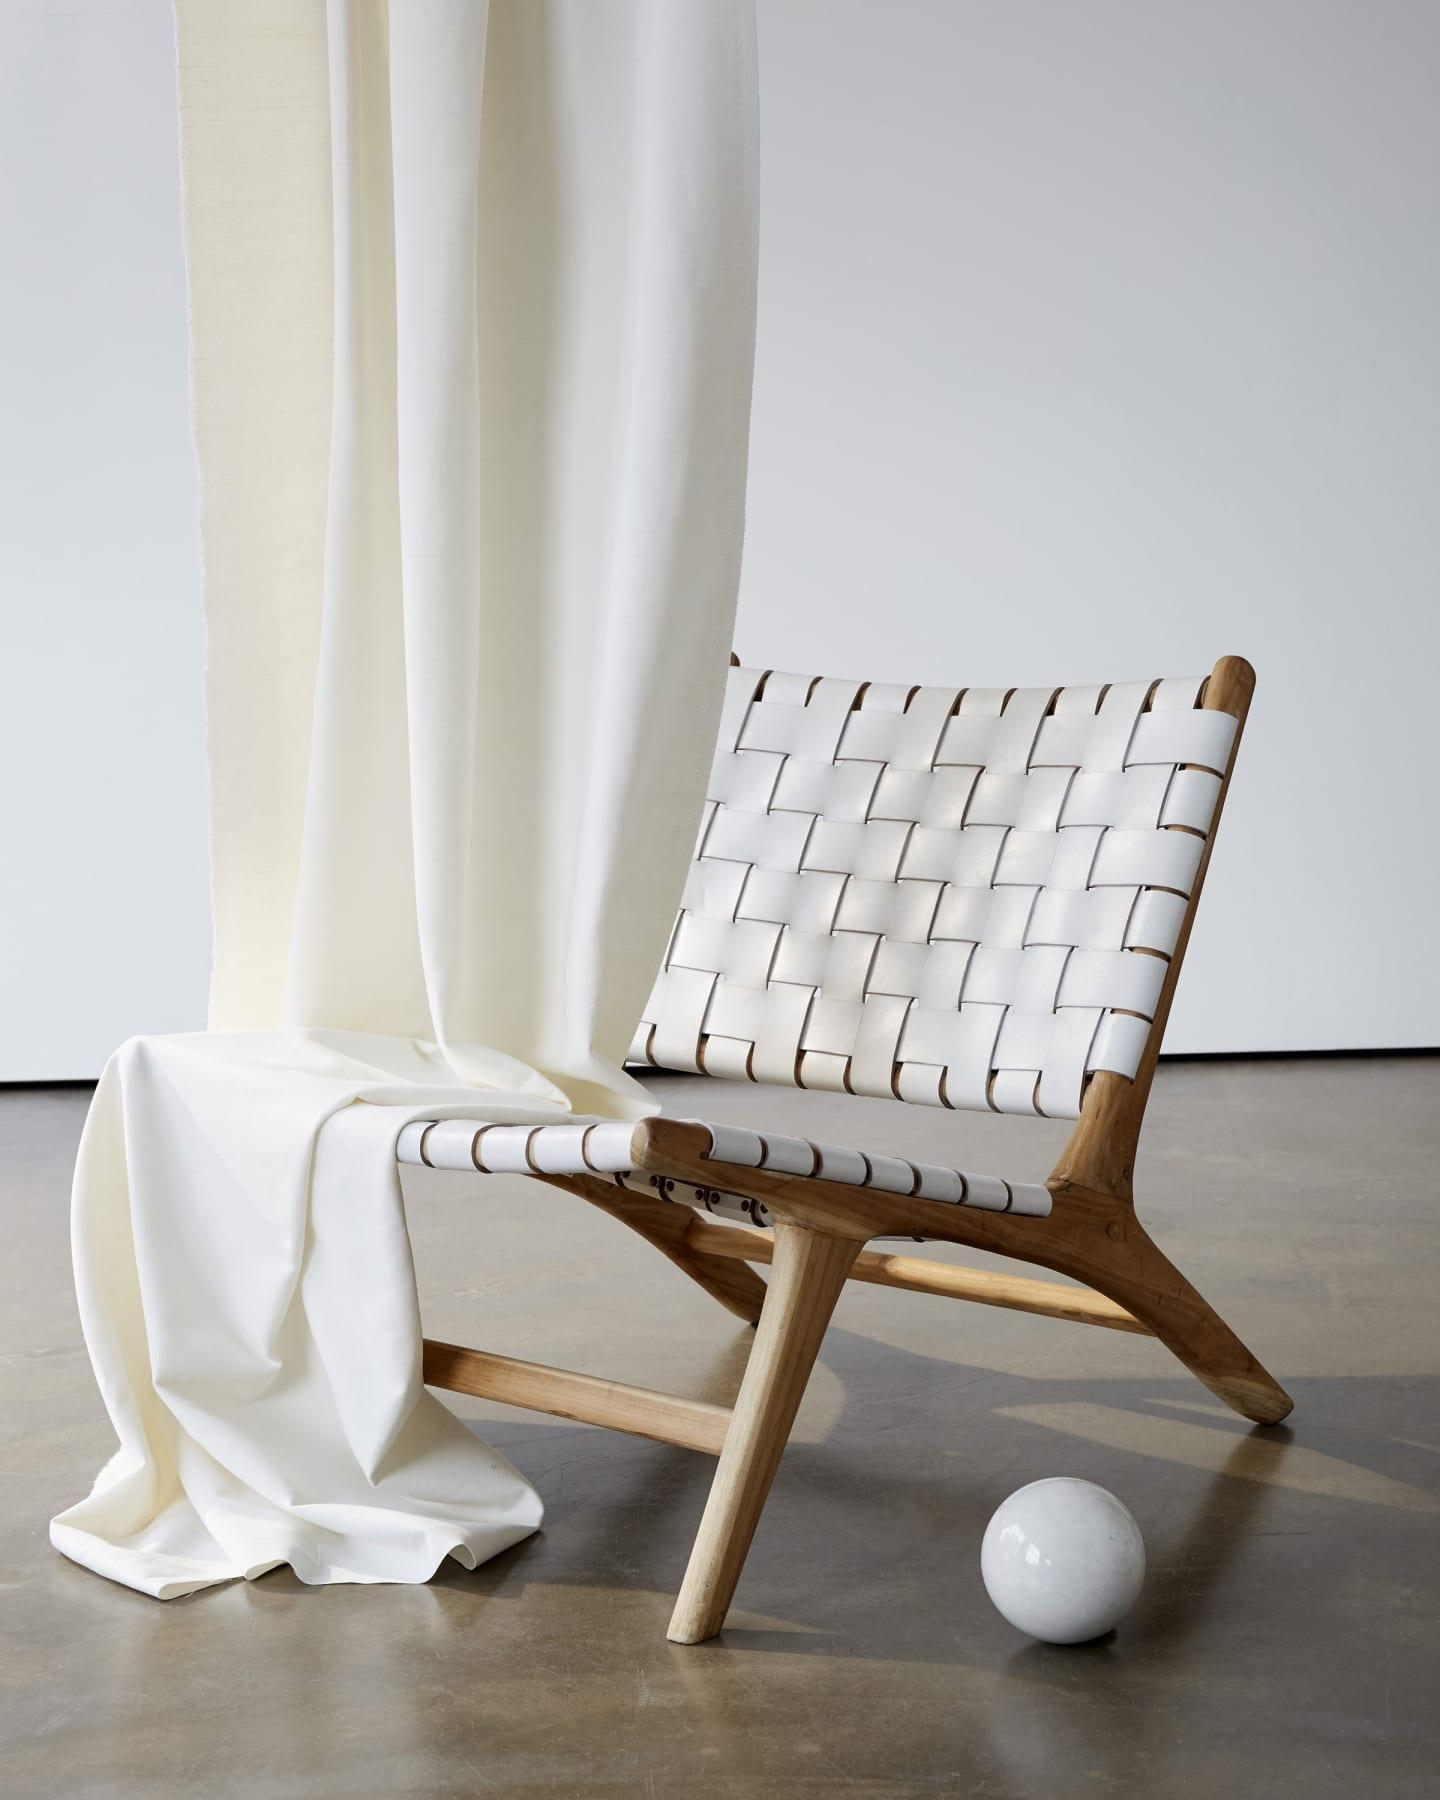 chalk curtain on a chair